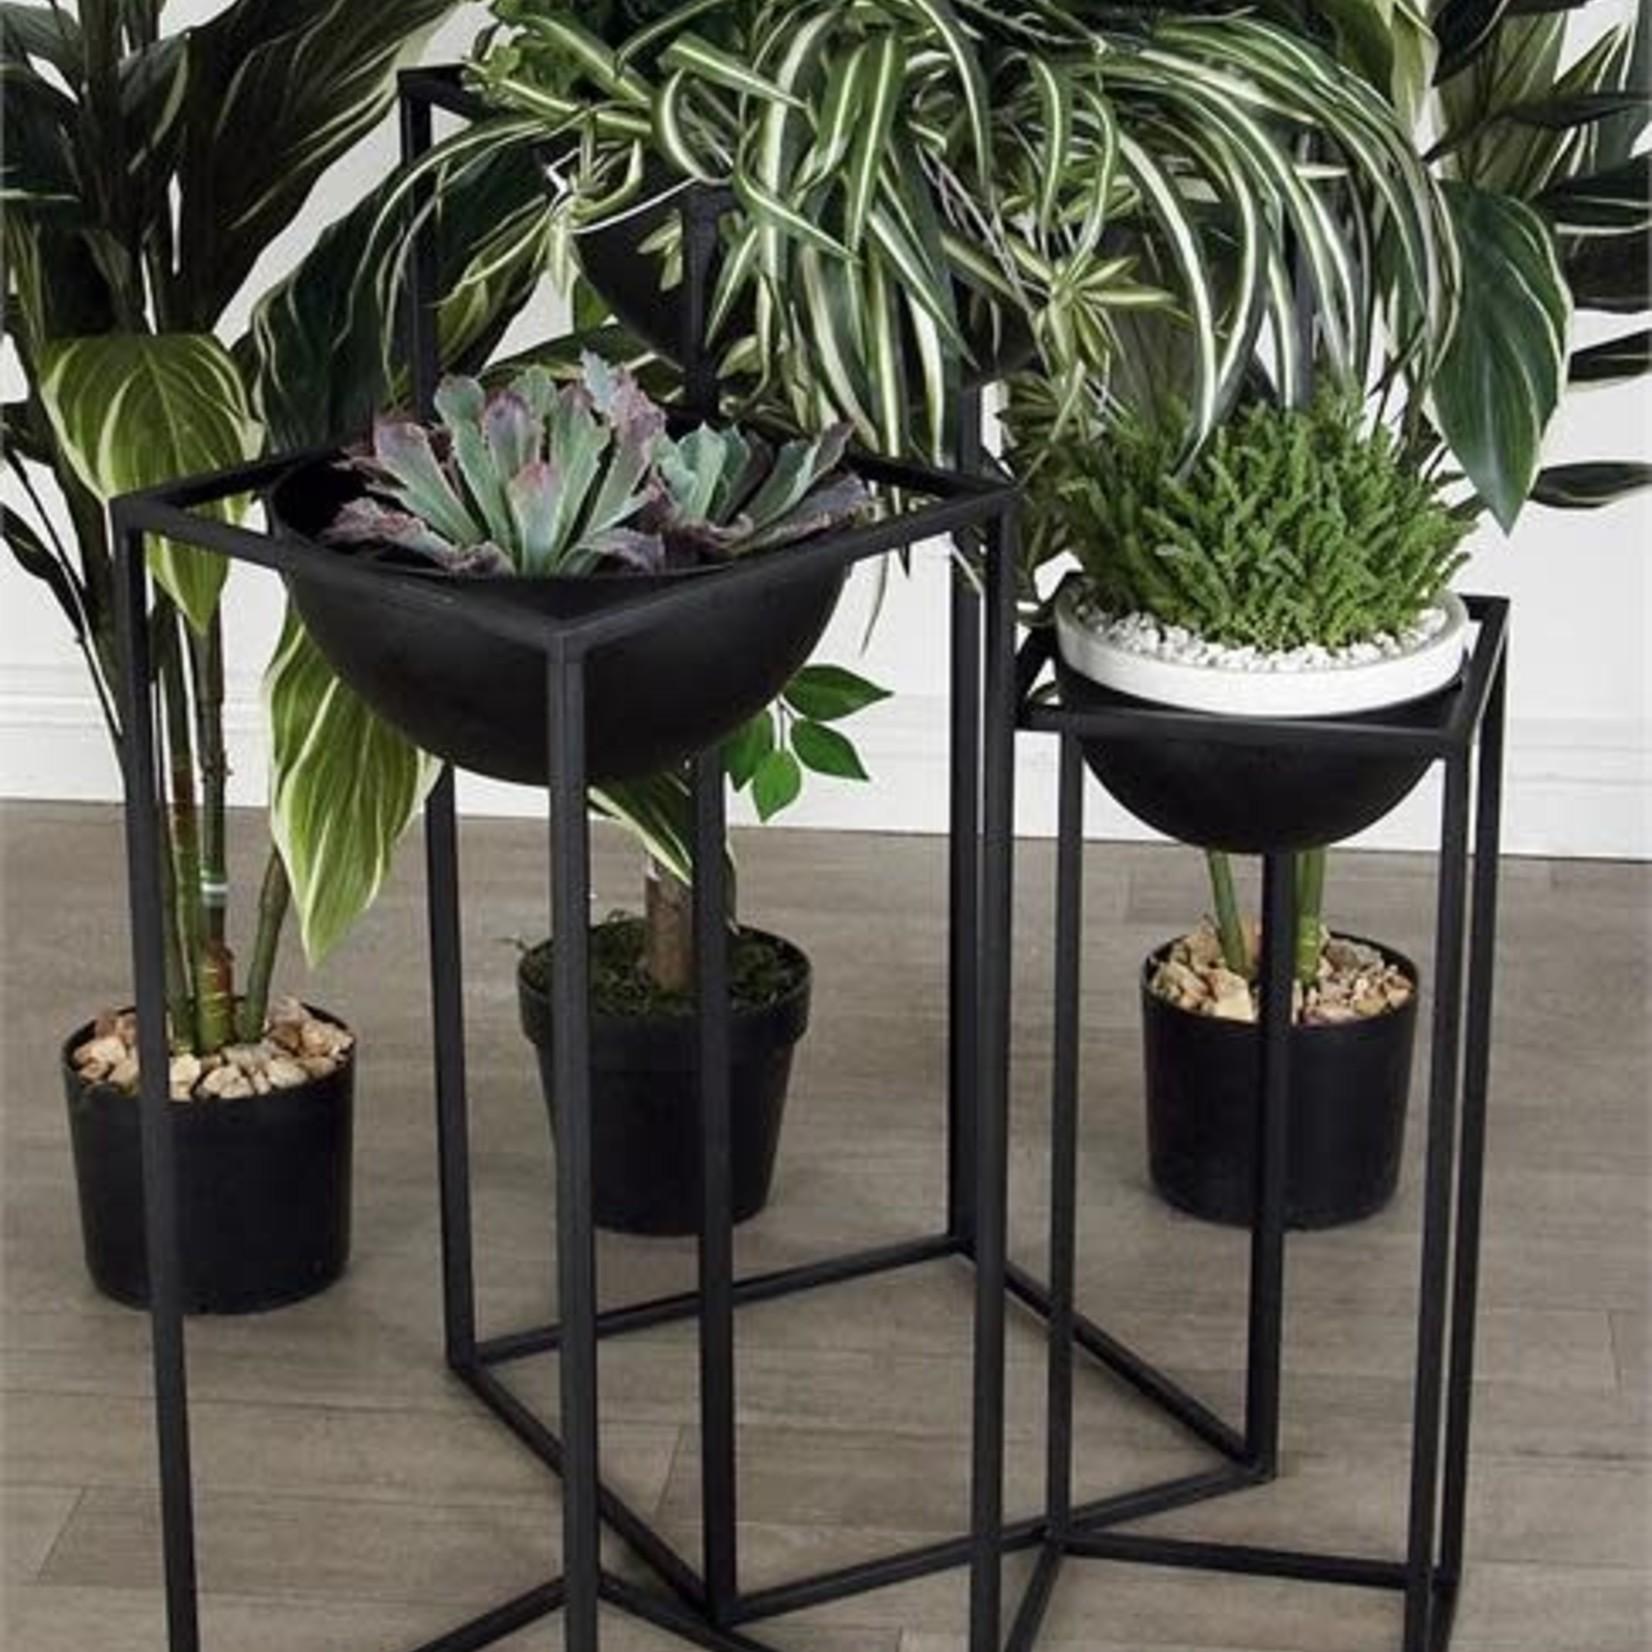 "20""H X 8"" X 8"" BLACK METAL PLANT STAND"